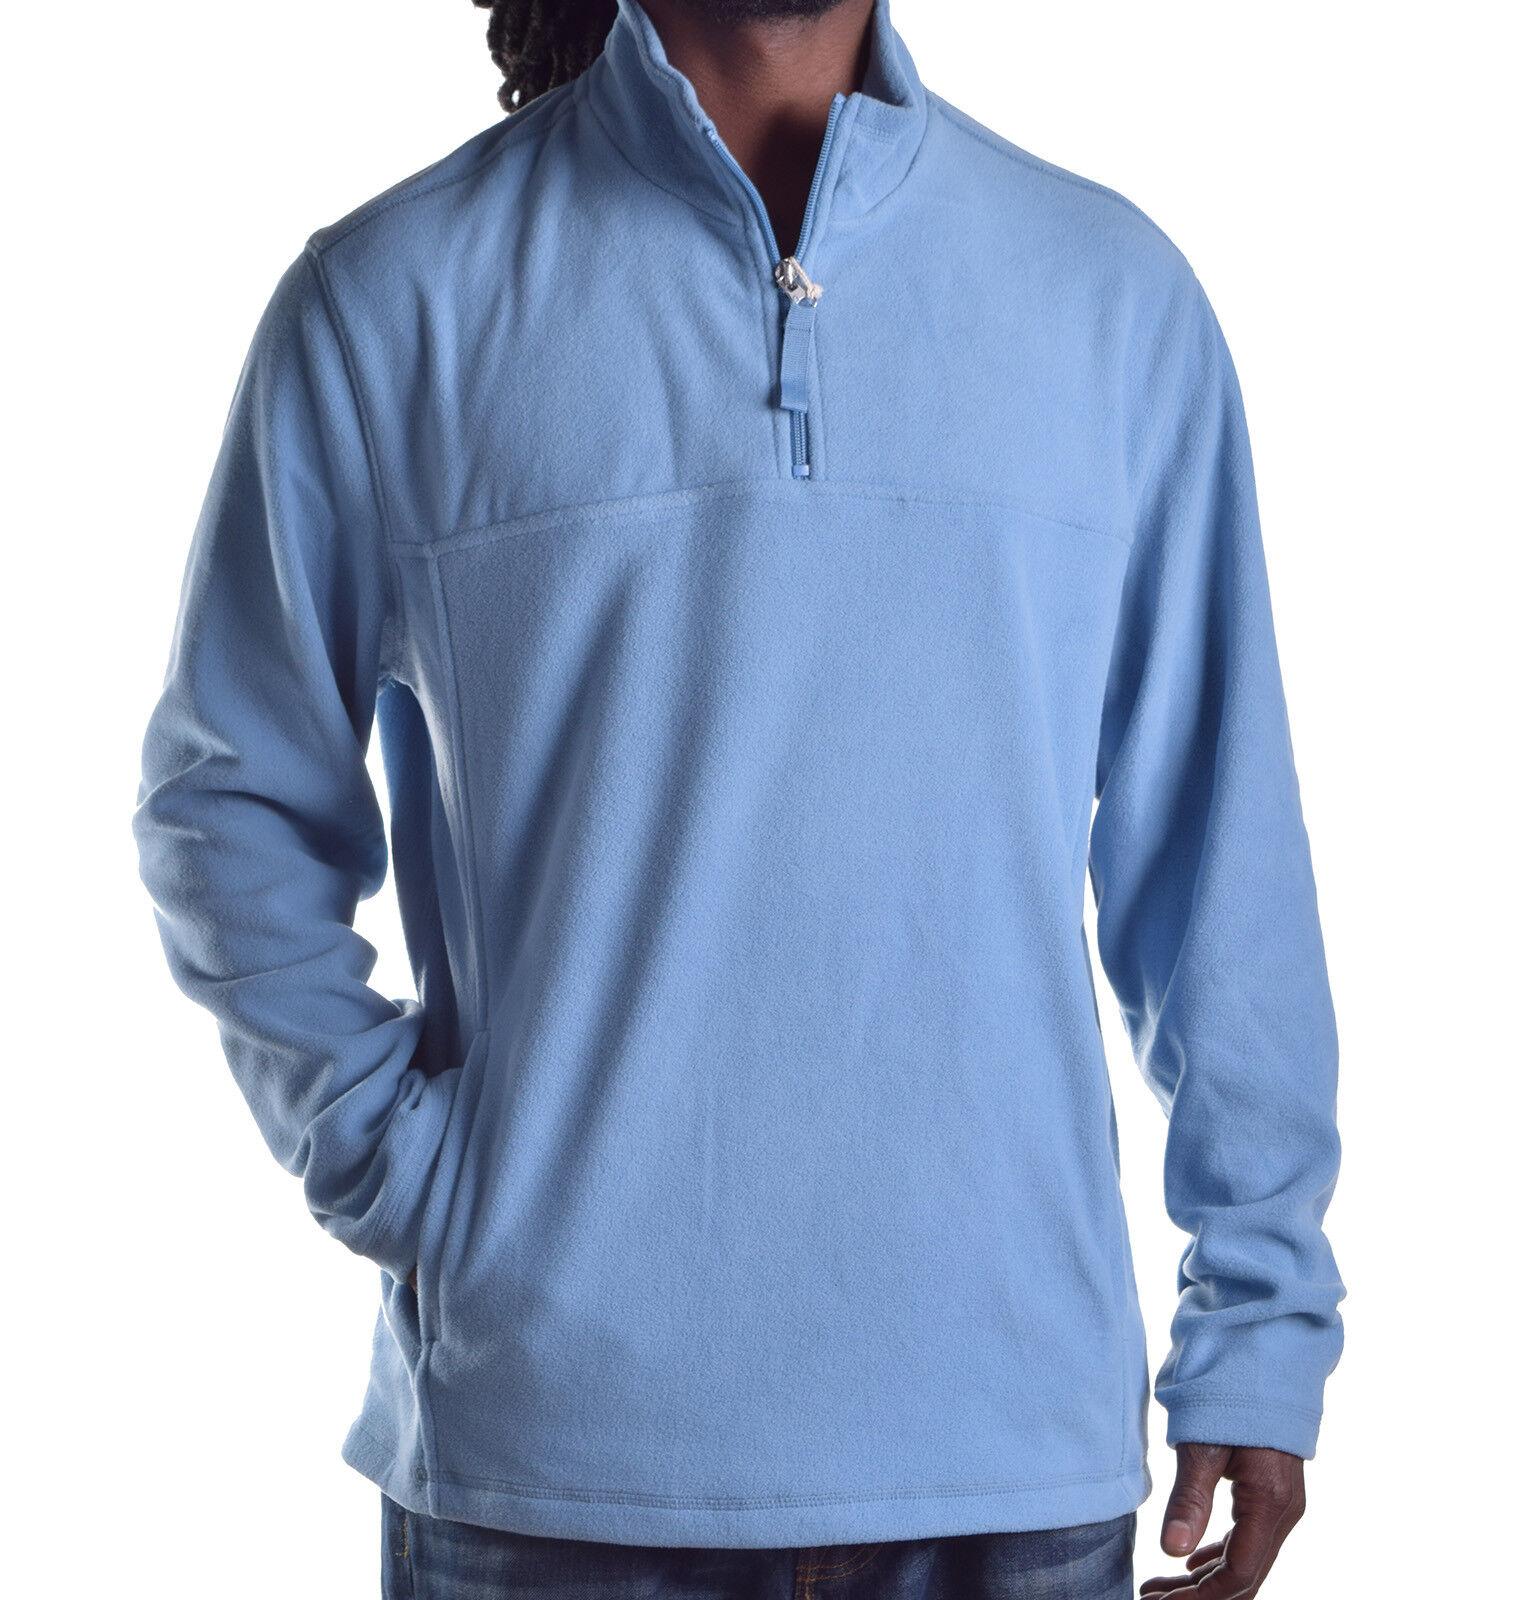 Club Room Big Sky Blue Fleece Solid Pullover Sweater Men Large L 1 ...